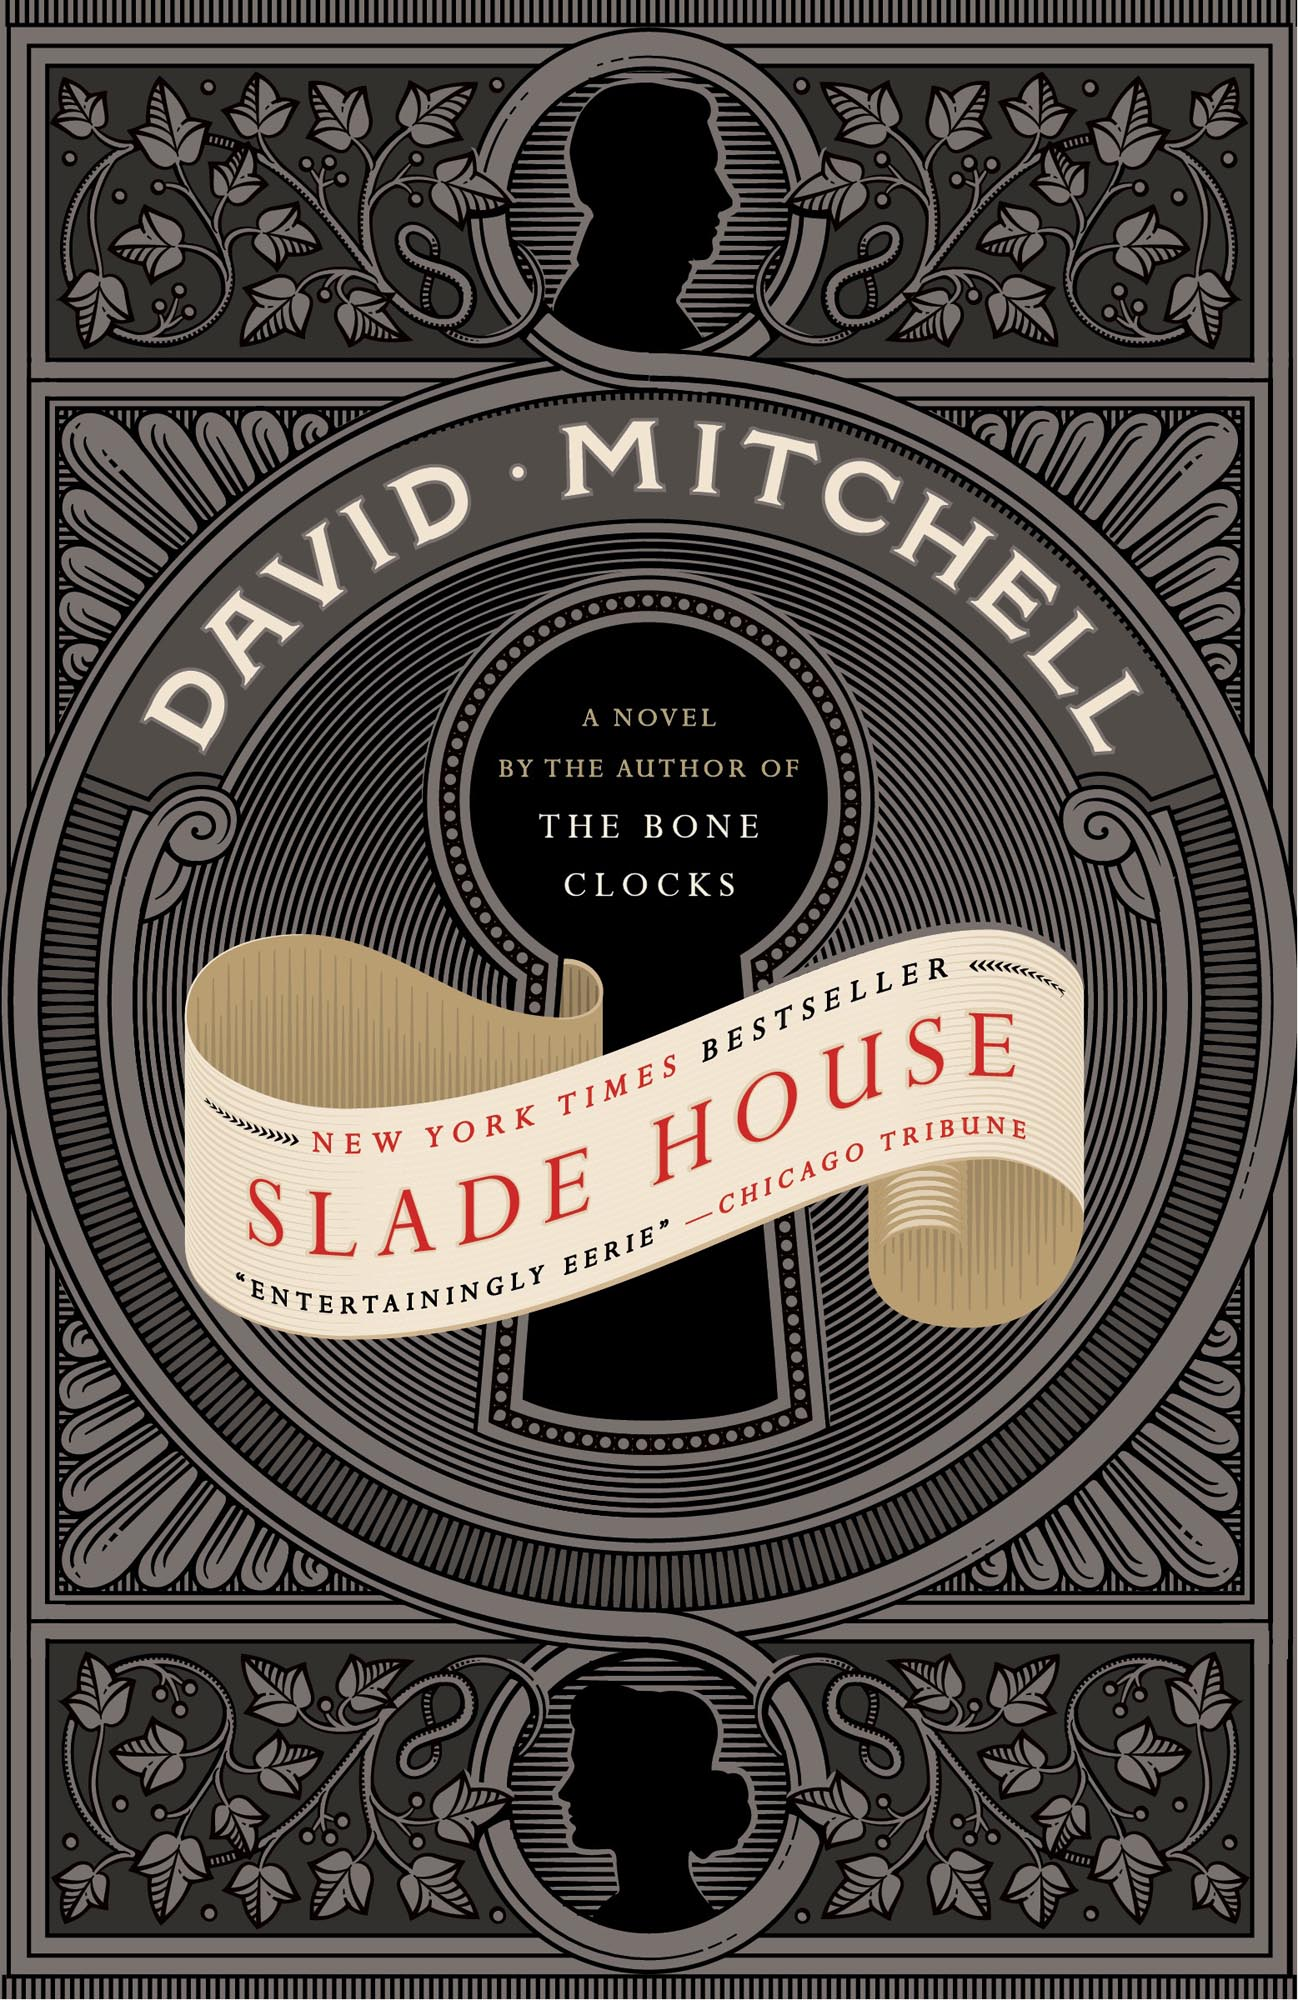 David Mitchell novels